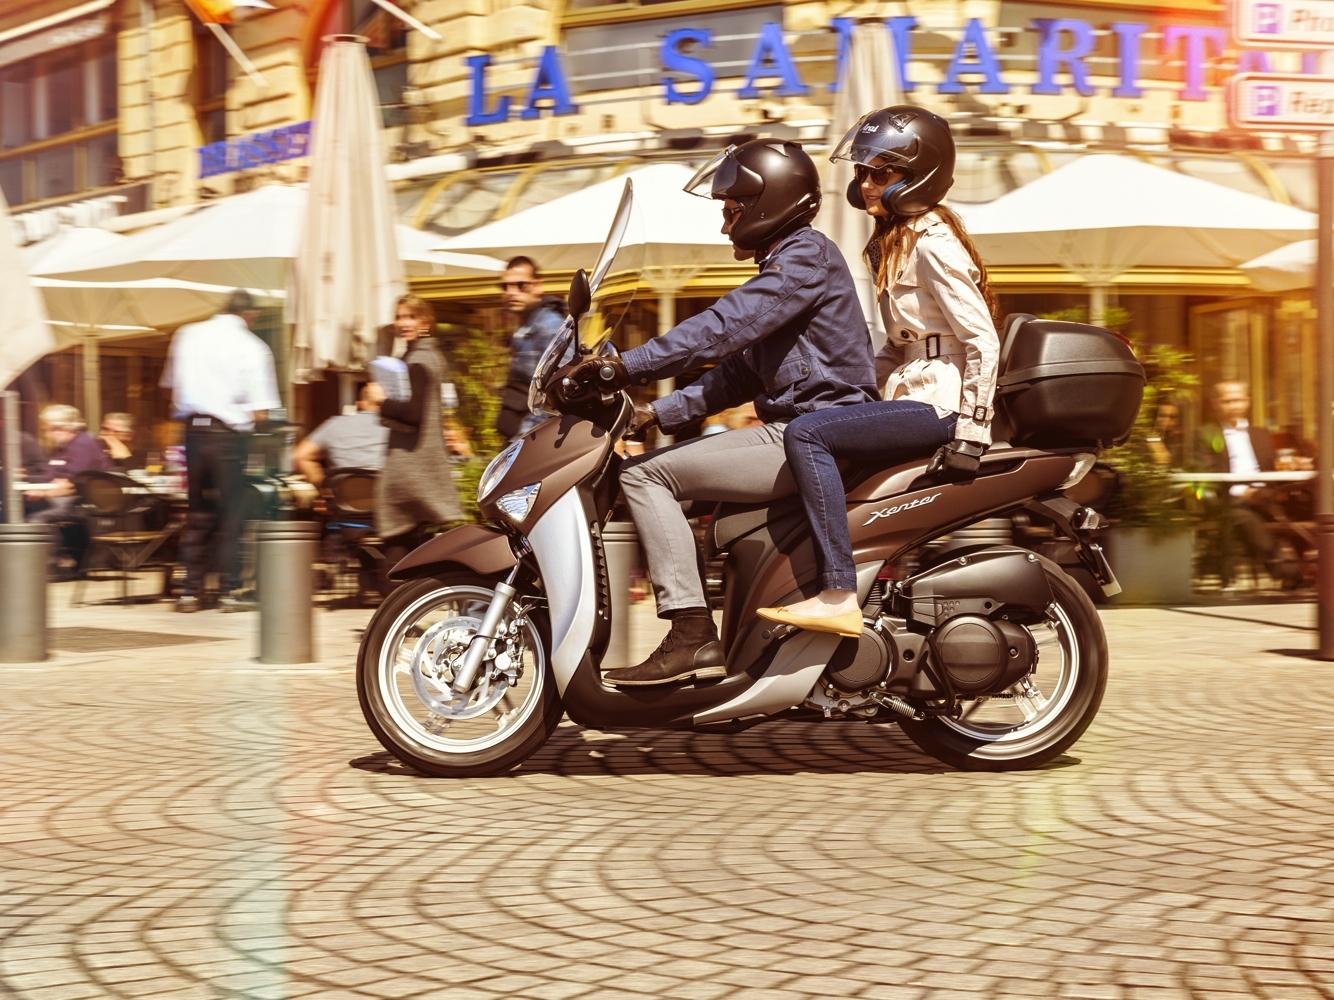 Yamaha Xenter 125 - InMoto